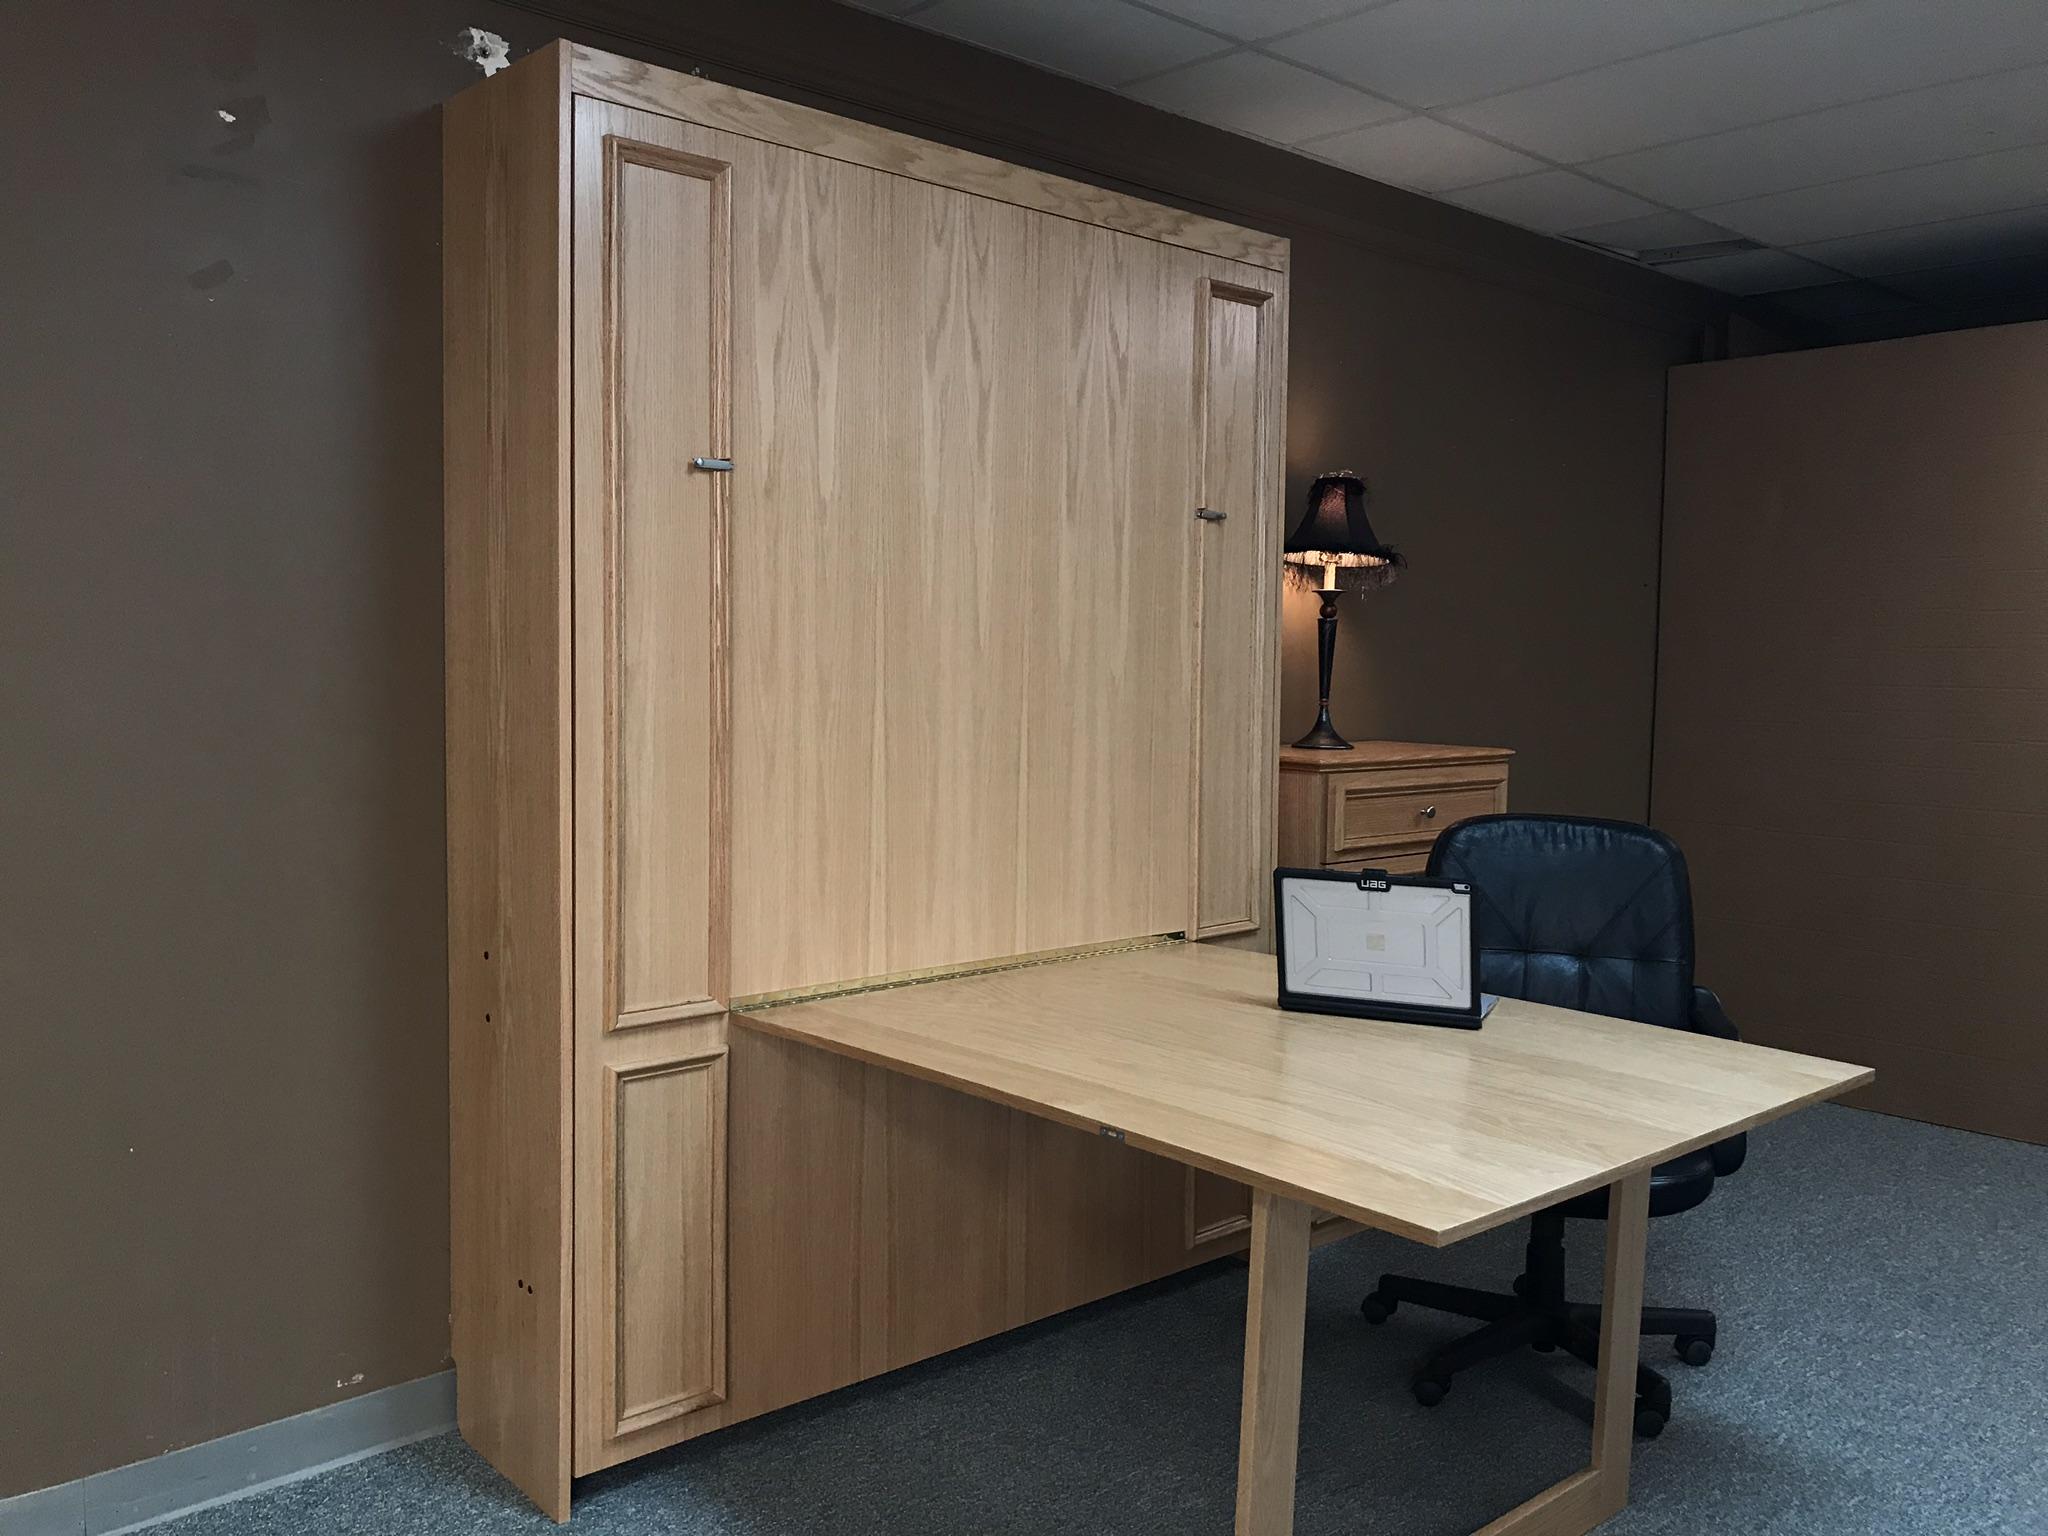 Hudson bay Desk #1411-1117